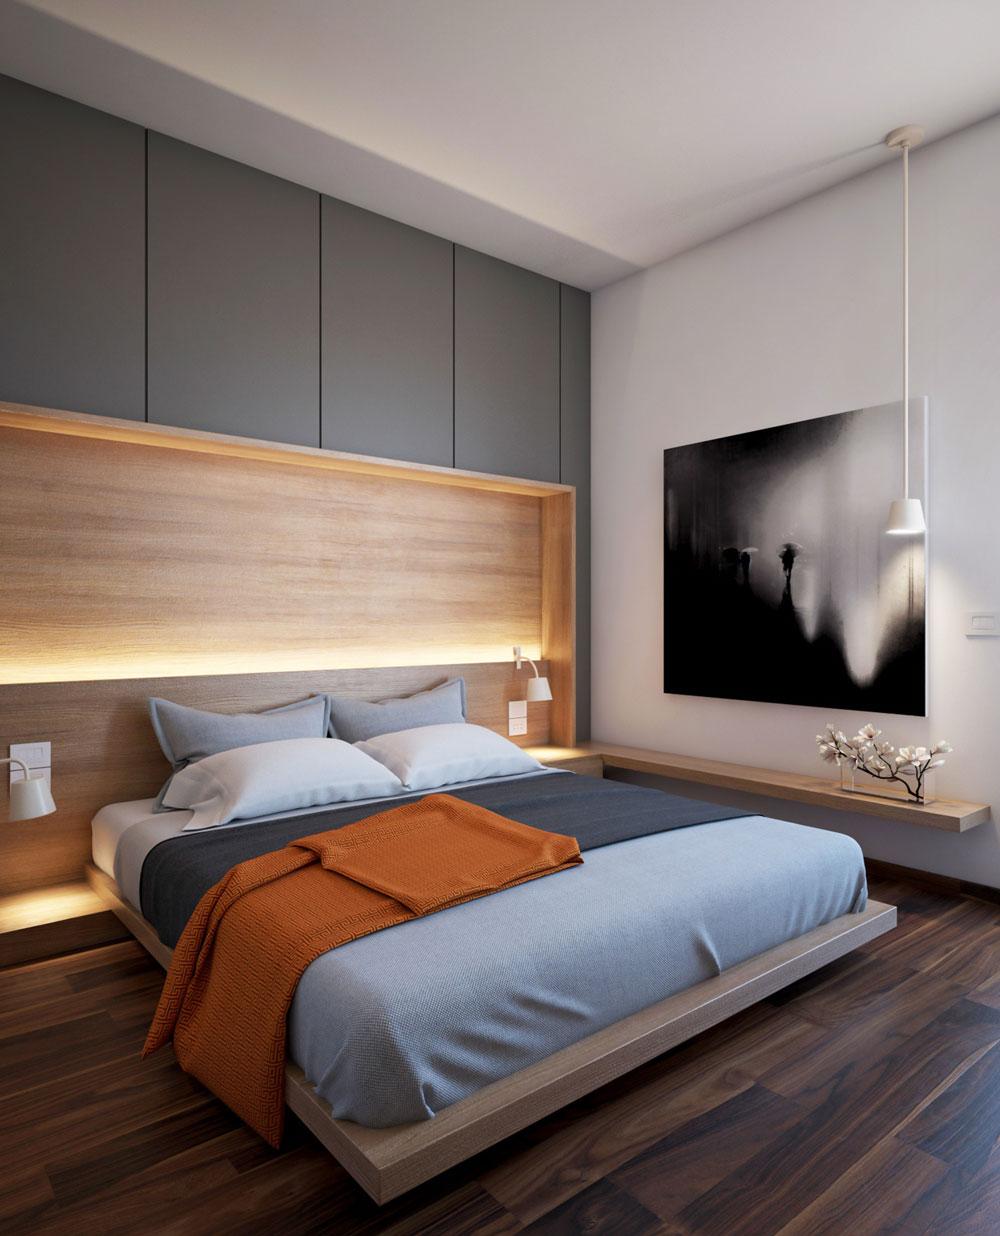 decorasion bedroom design2 - نکاتی در مورد تزیین اتاق خواب